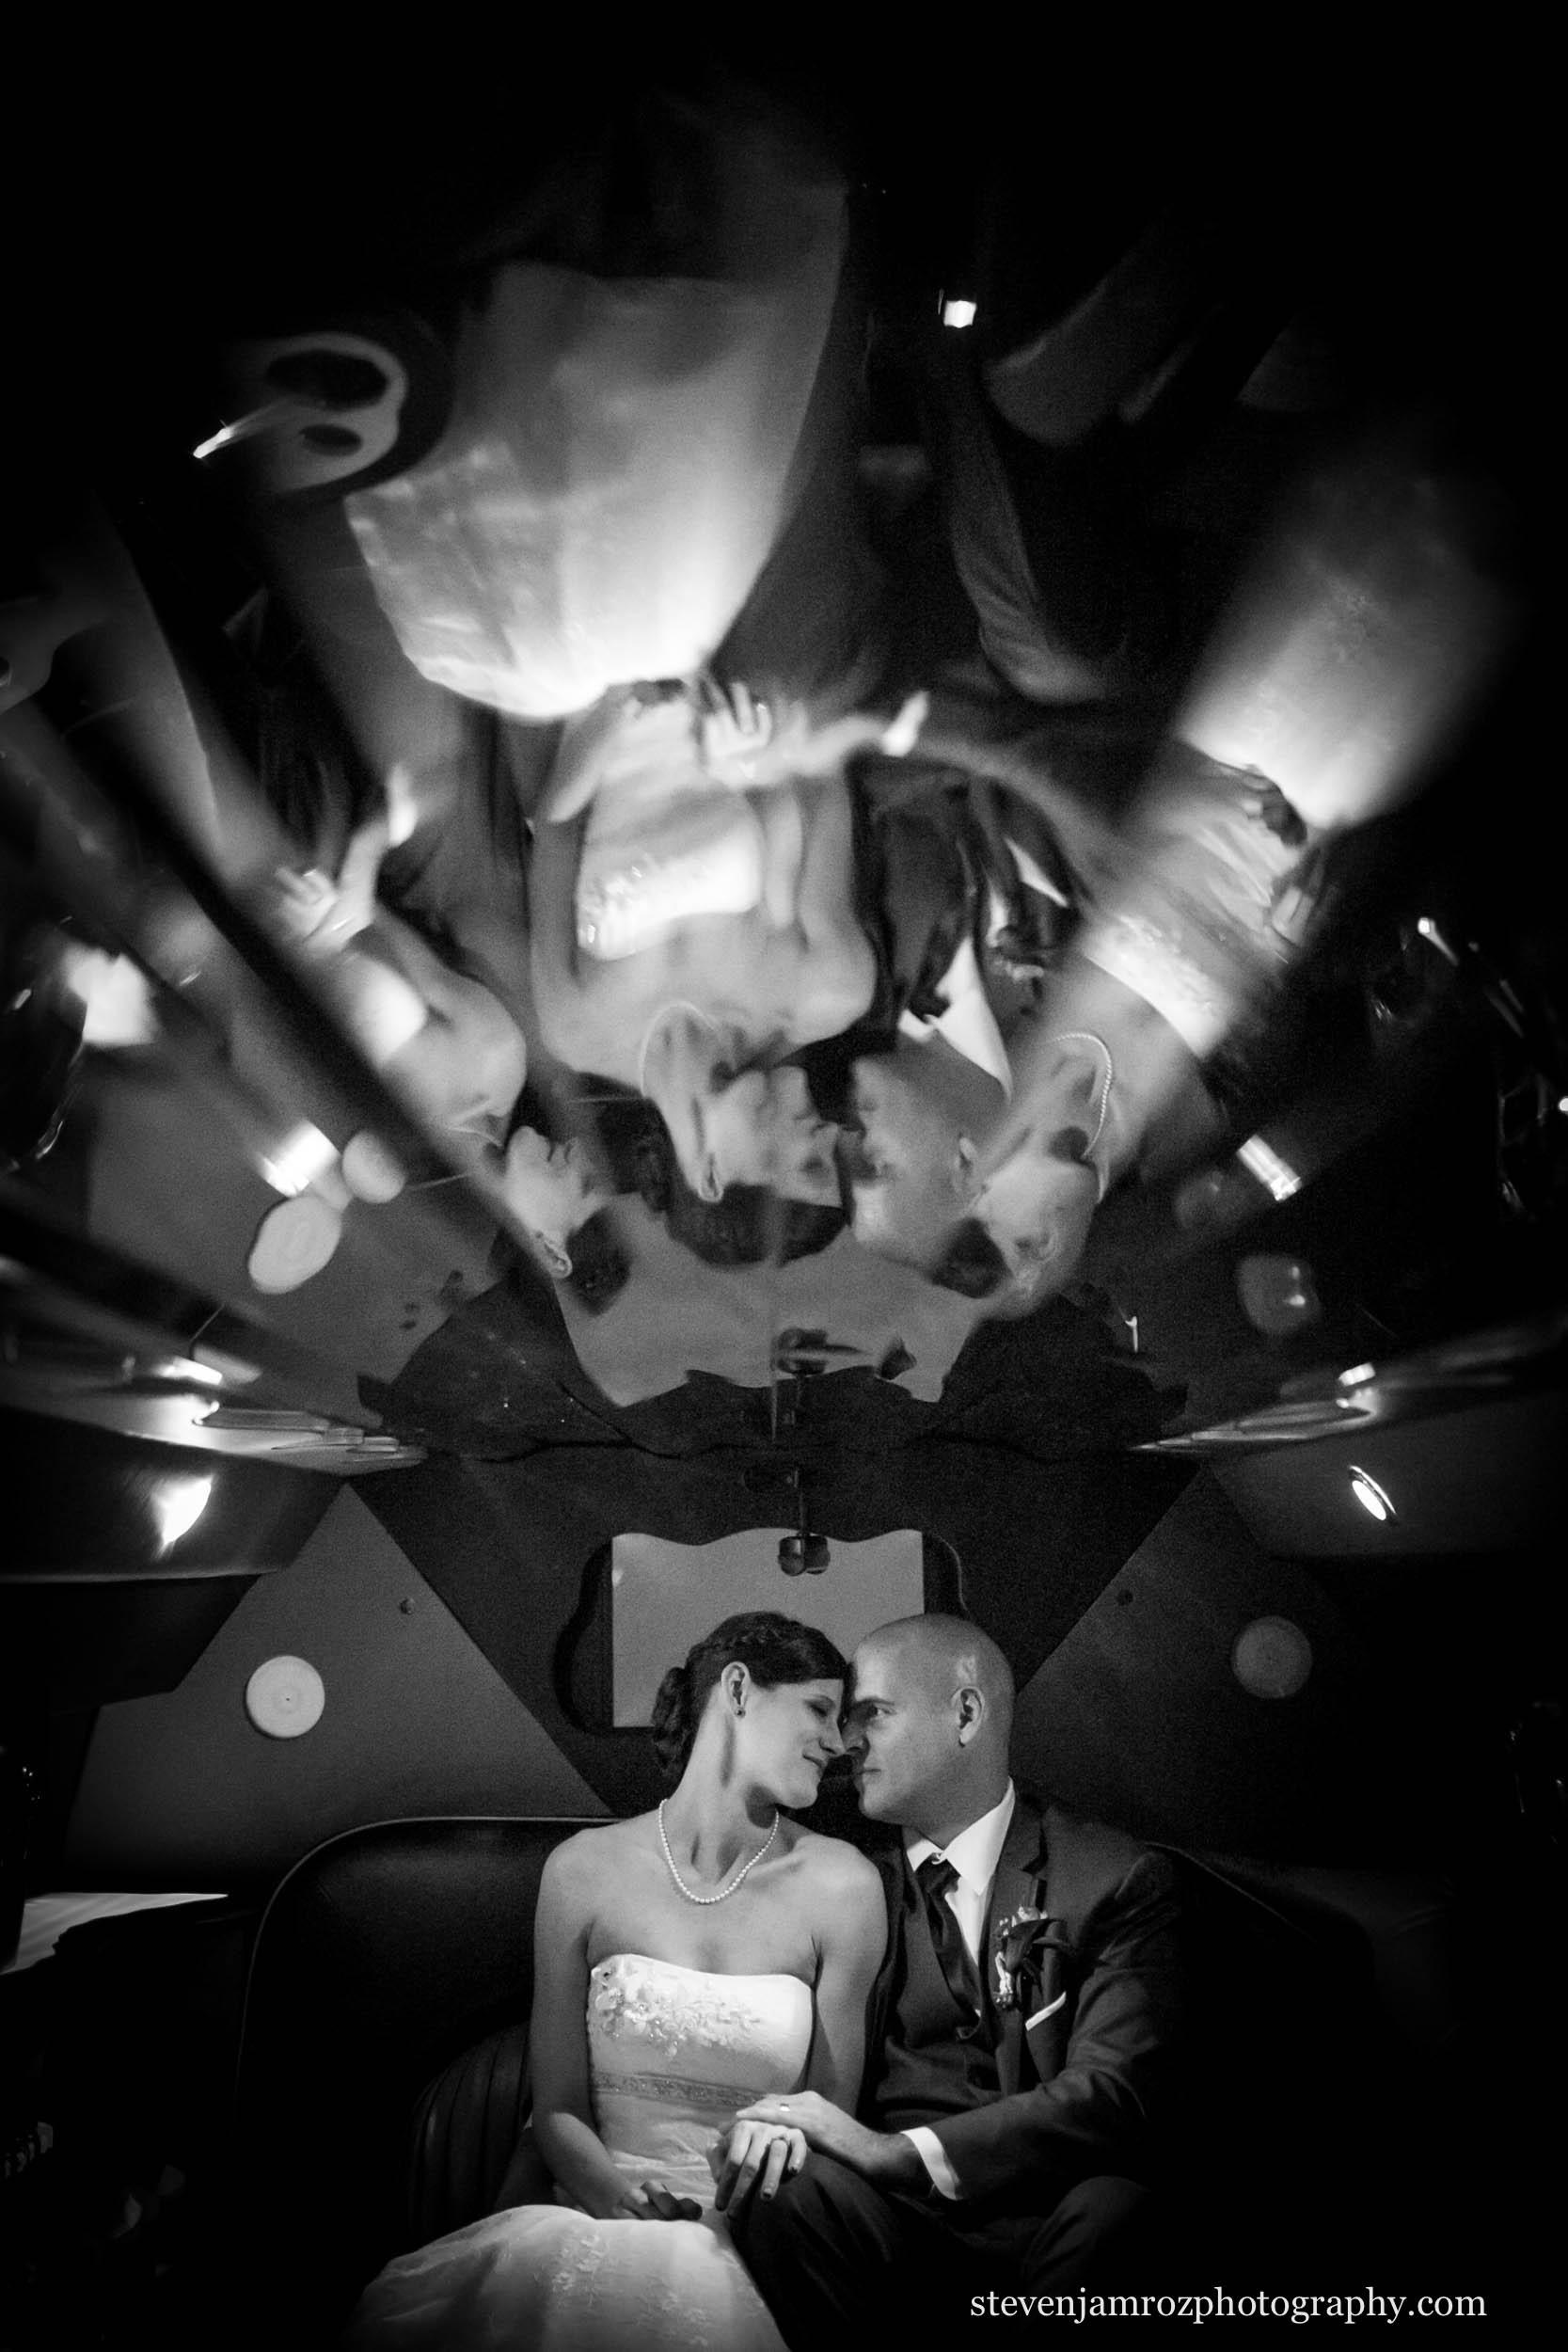 limo-ride-bride-groom-steven-jamroz-photography-0511.jpg